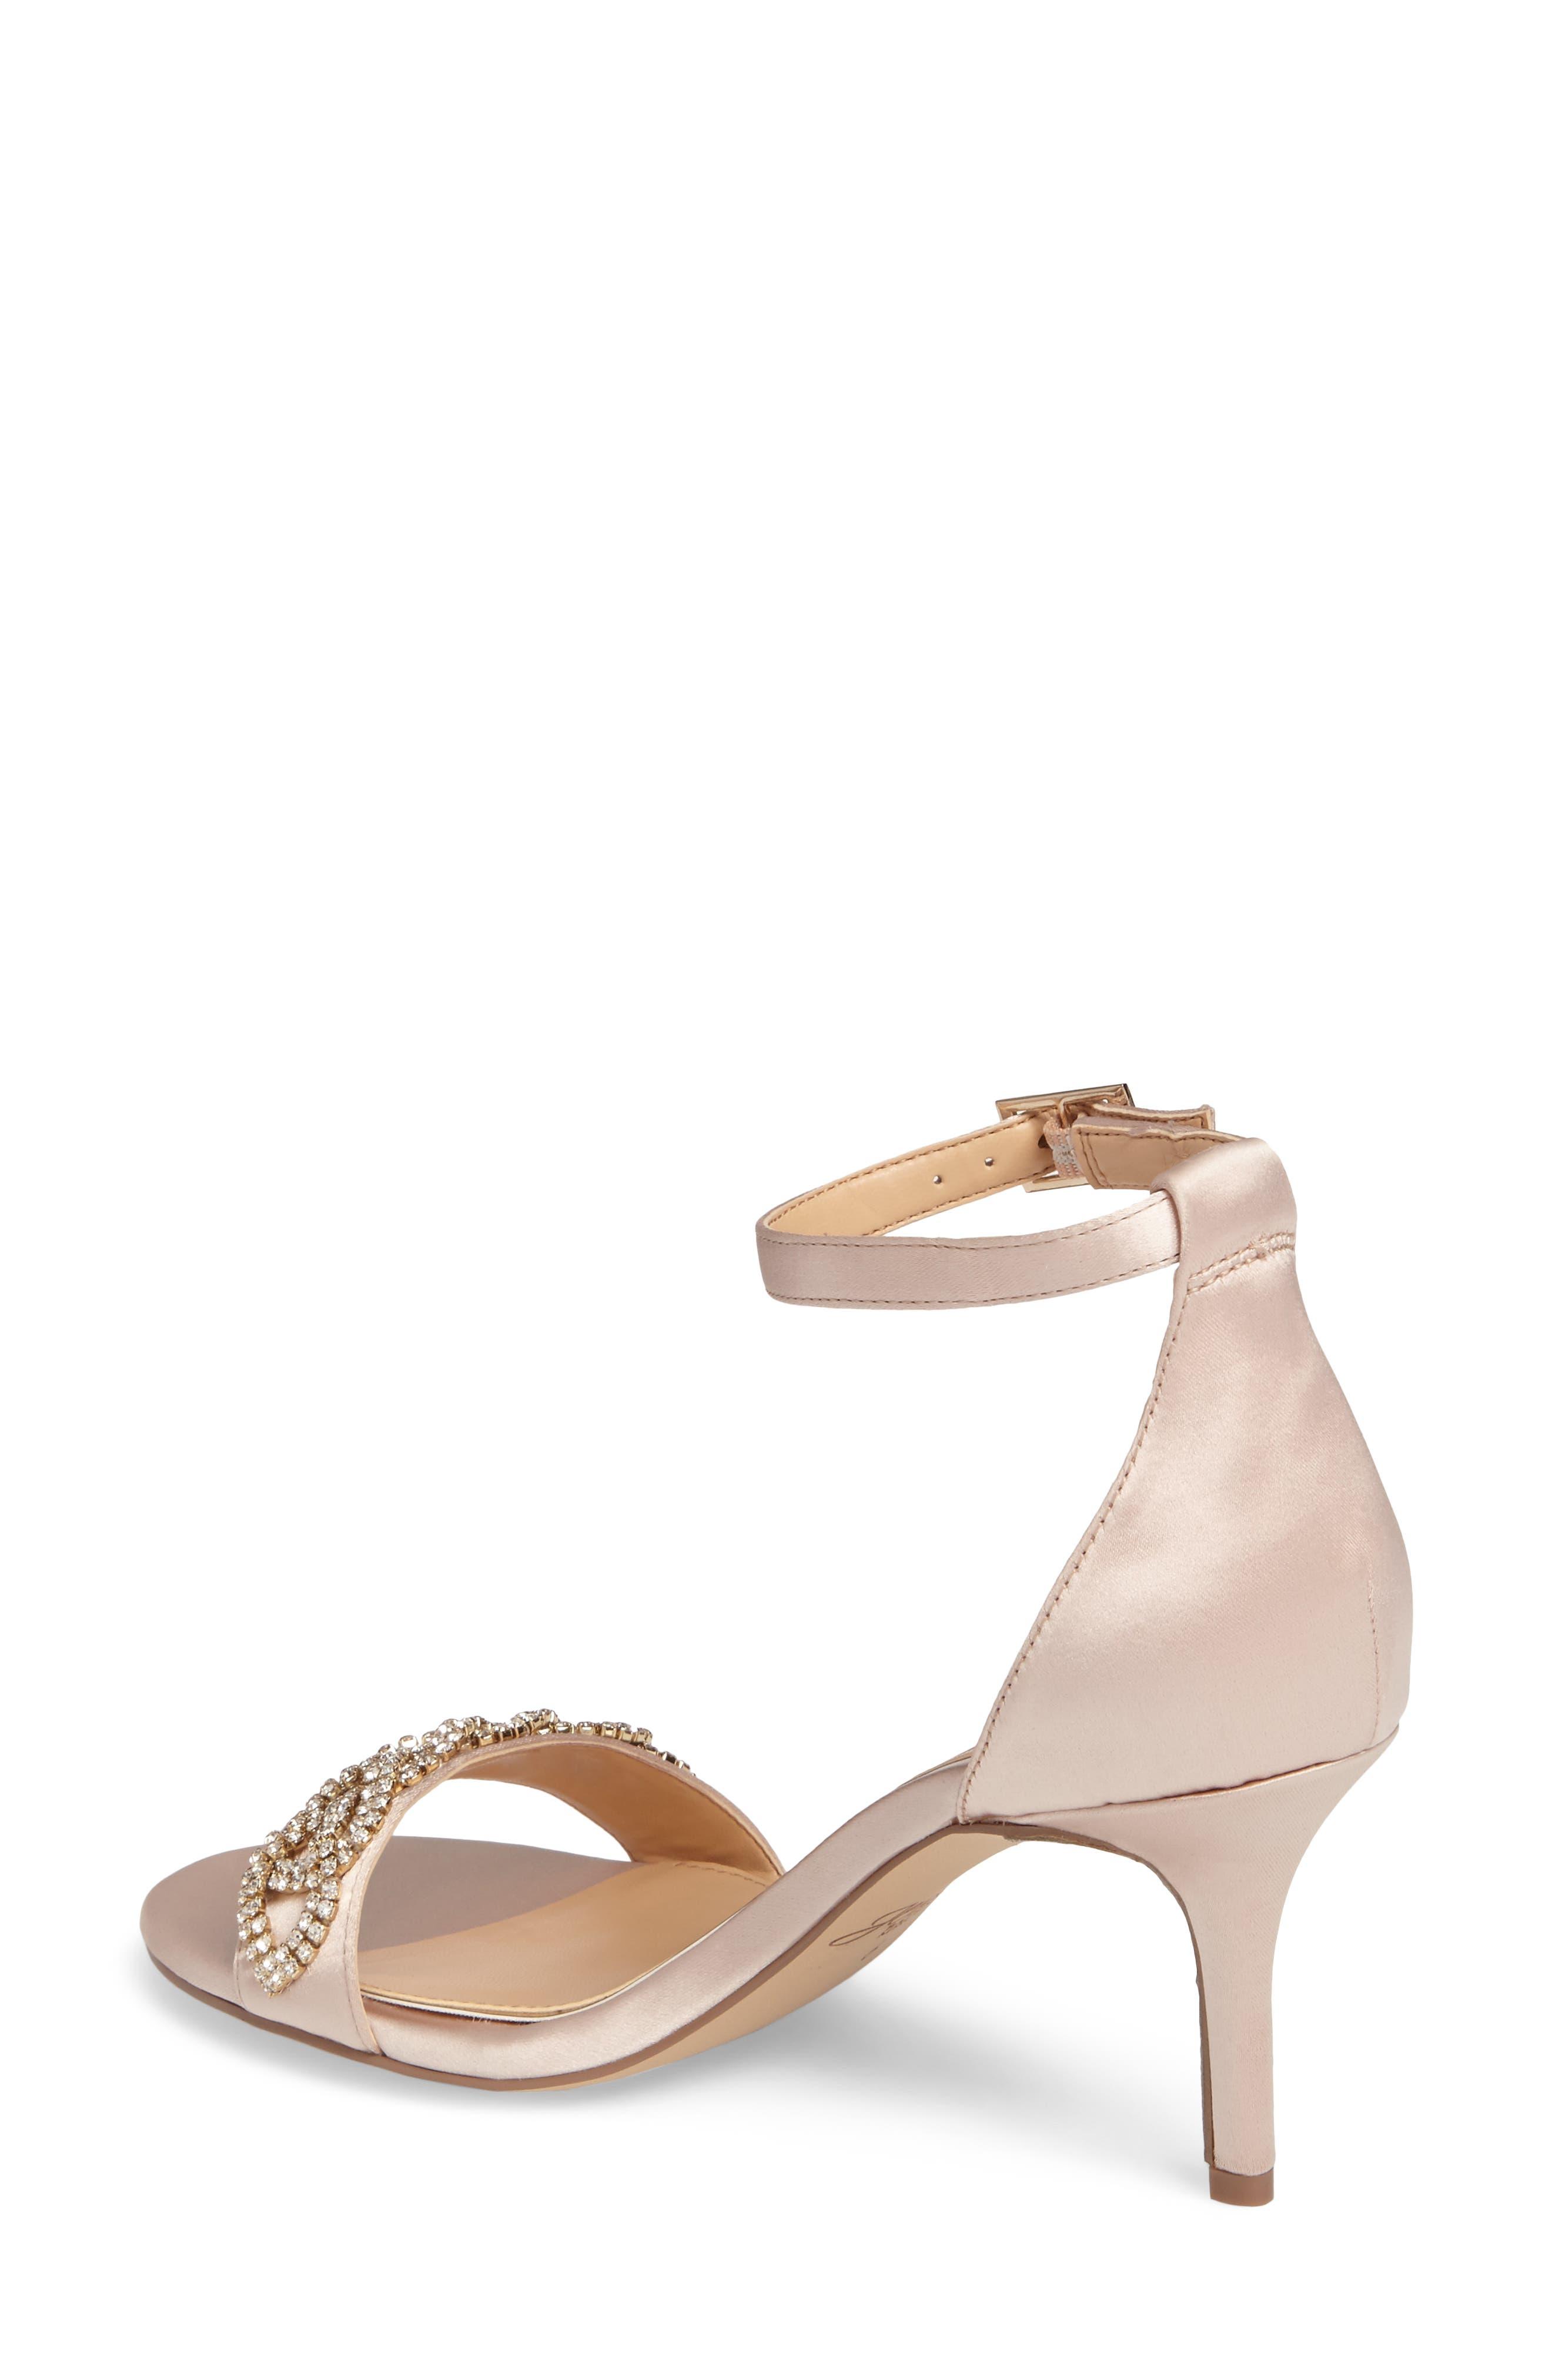 Alana Ankle Strap Sandal,                             Alternate thumbnail 2, color,                             Champagne Satin